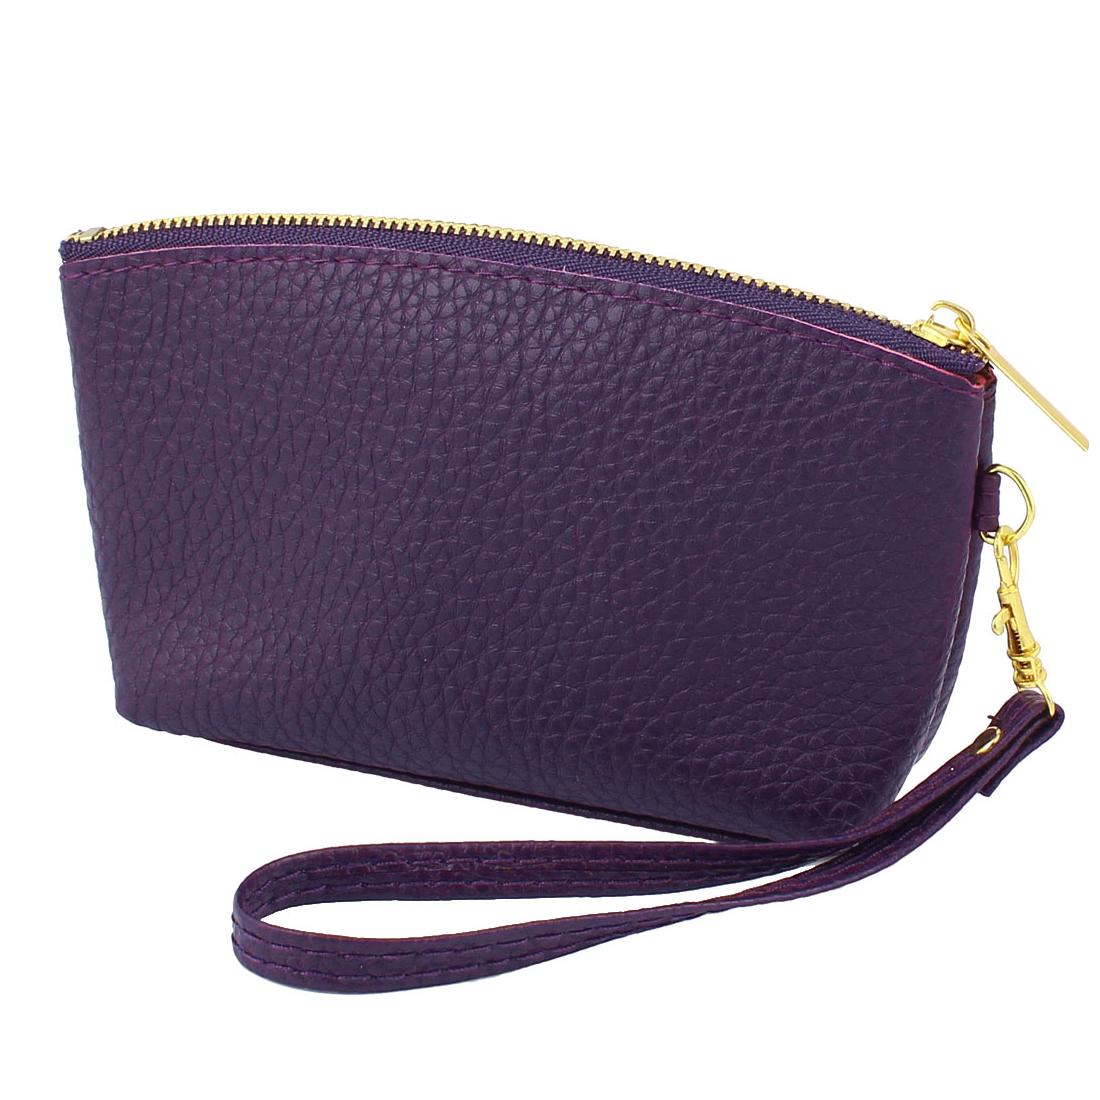 PU Leather Zipper Closure Coin Bag Purse Wallet Card Holder Dark Purple